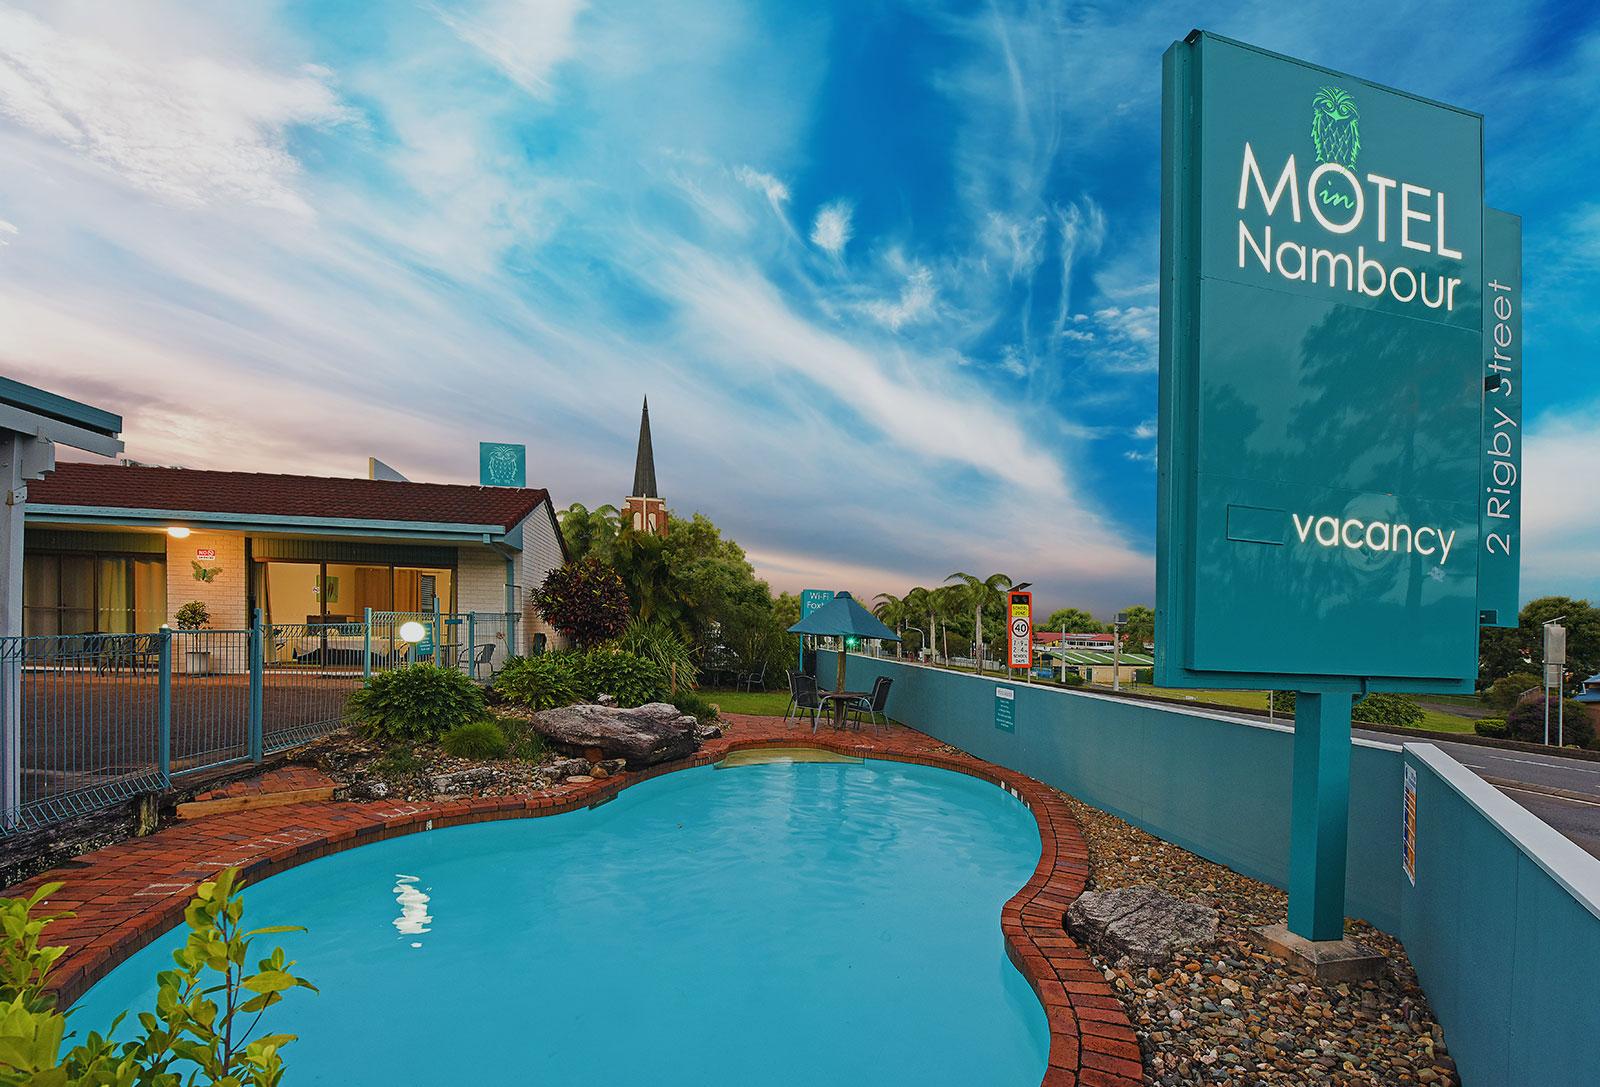 The Award Winning Motel in Nambour